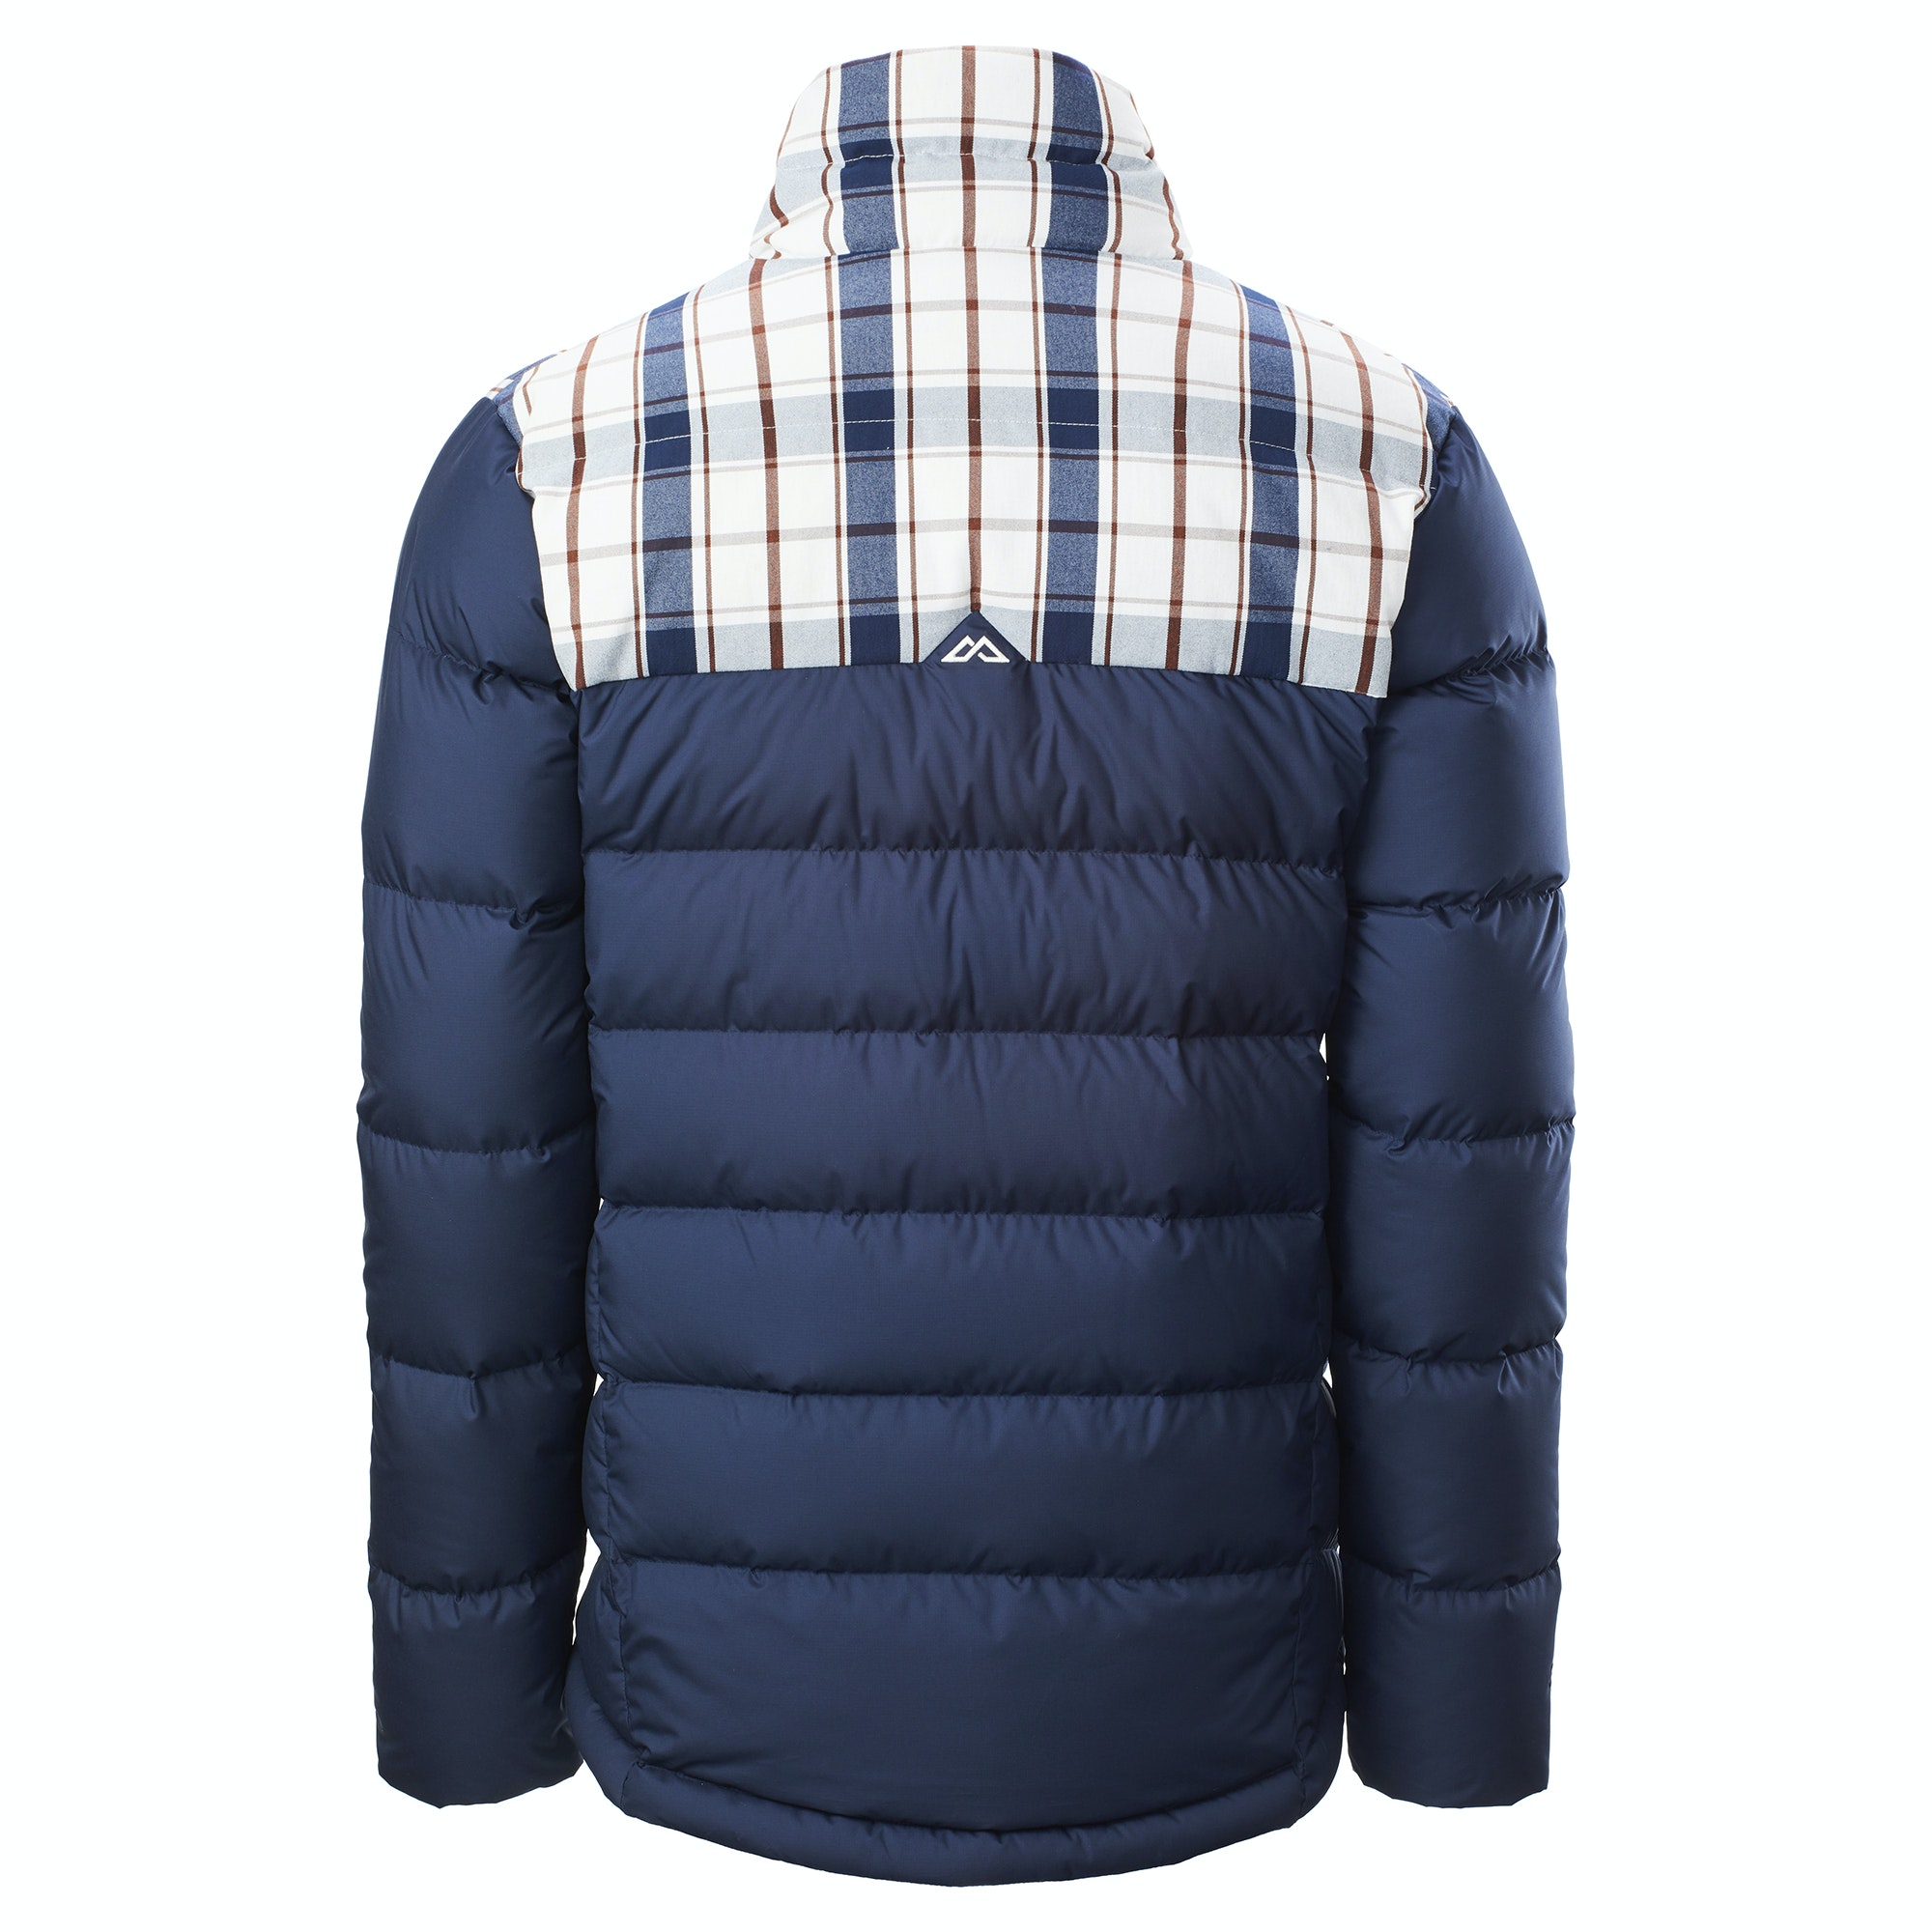 NEW-Kathmandu-Epiq-Men-039-s-Warm-Winter-Duck-Down-Puffer-Jacket-v2 thumbnail 21